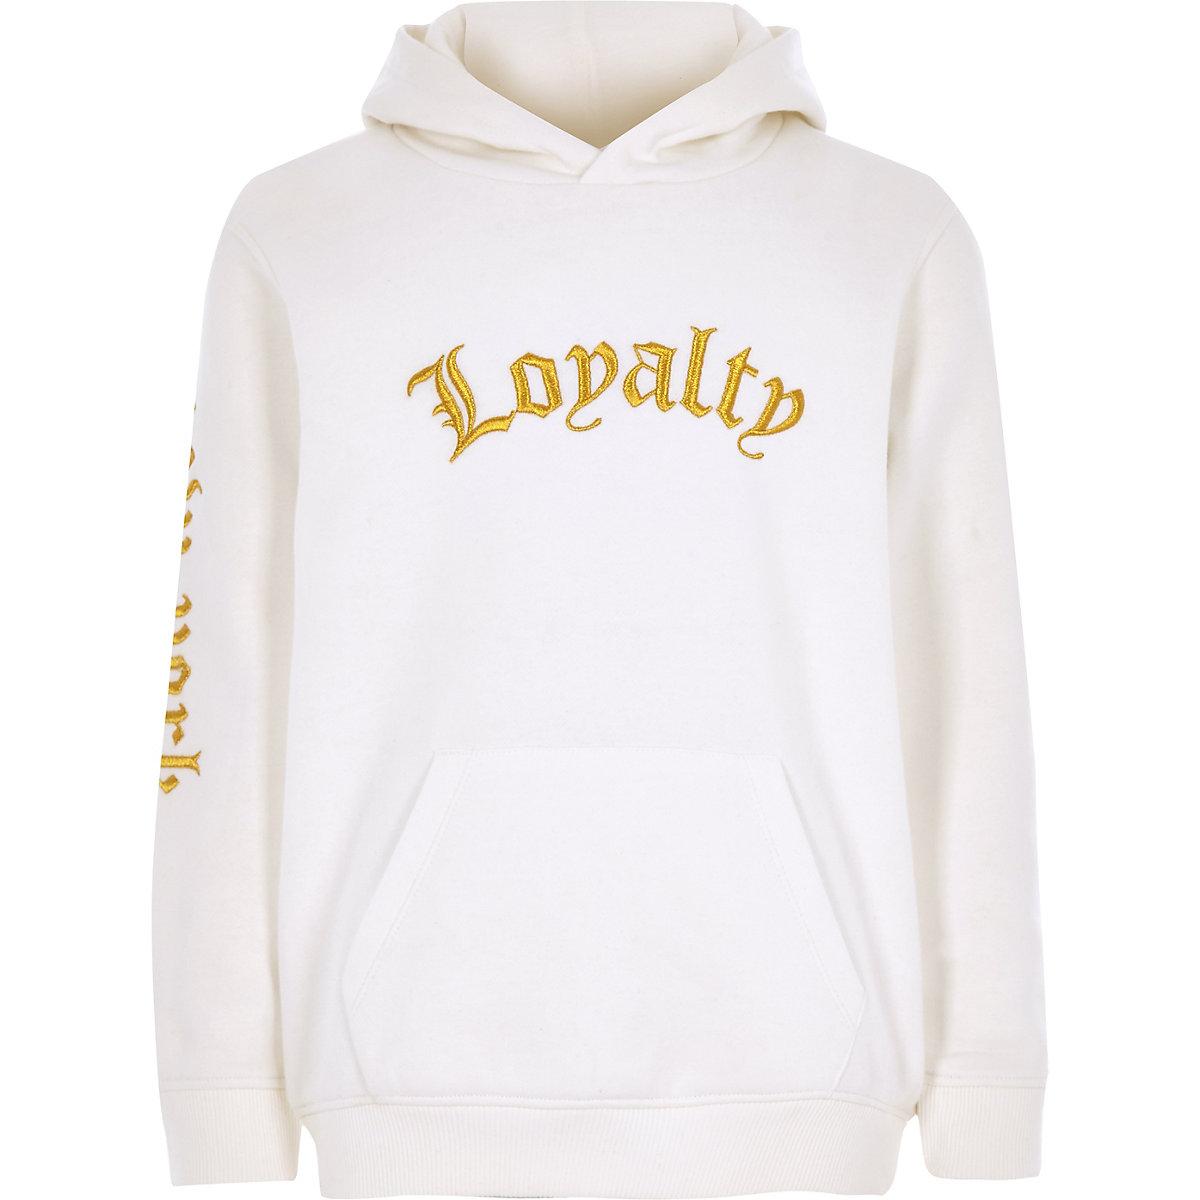 "Weißer, bestickter Hoodie ""loyalty"""